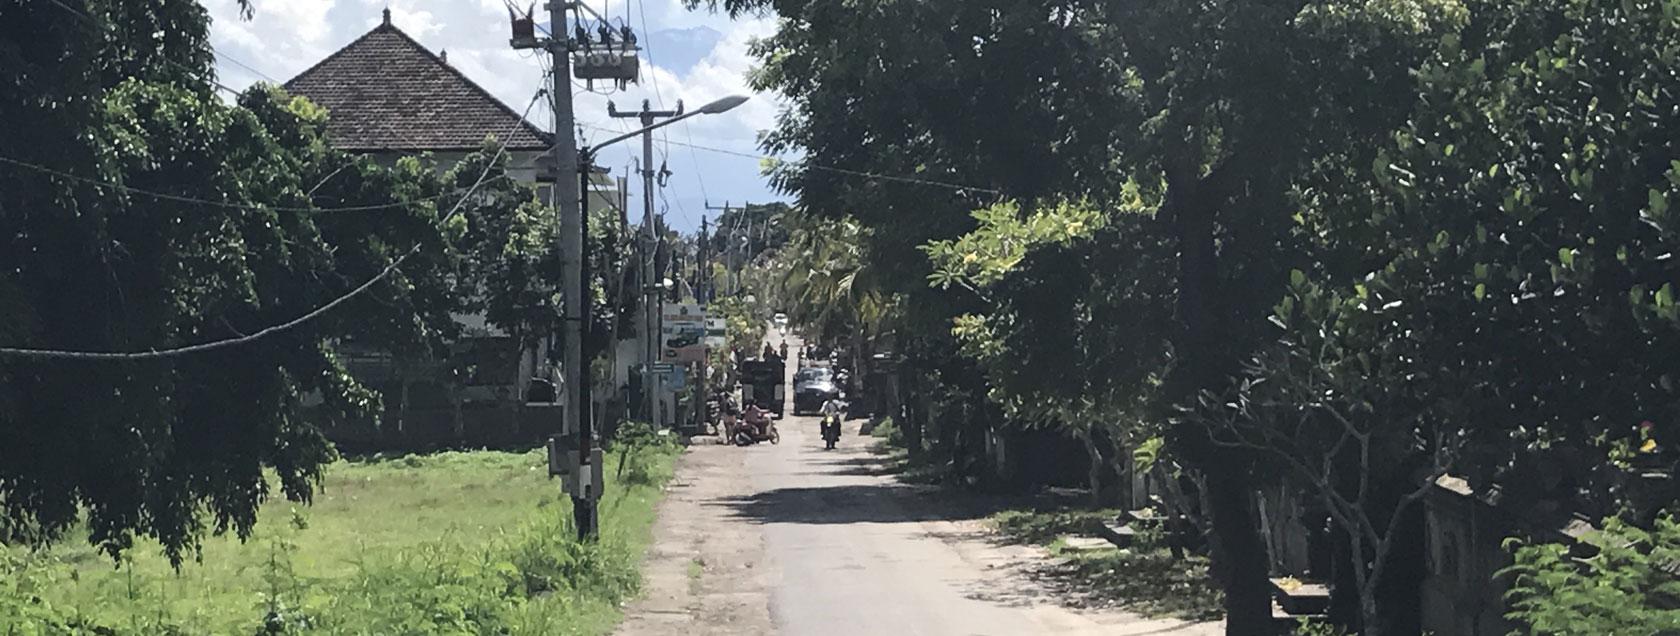 Jungut Batu Village - Lembongan Sightseeing